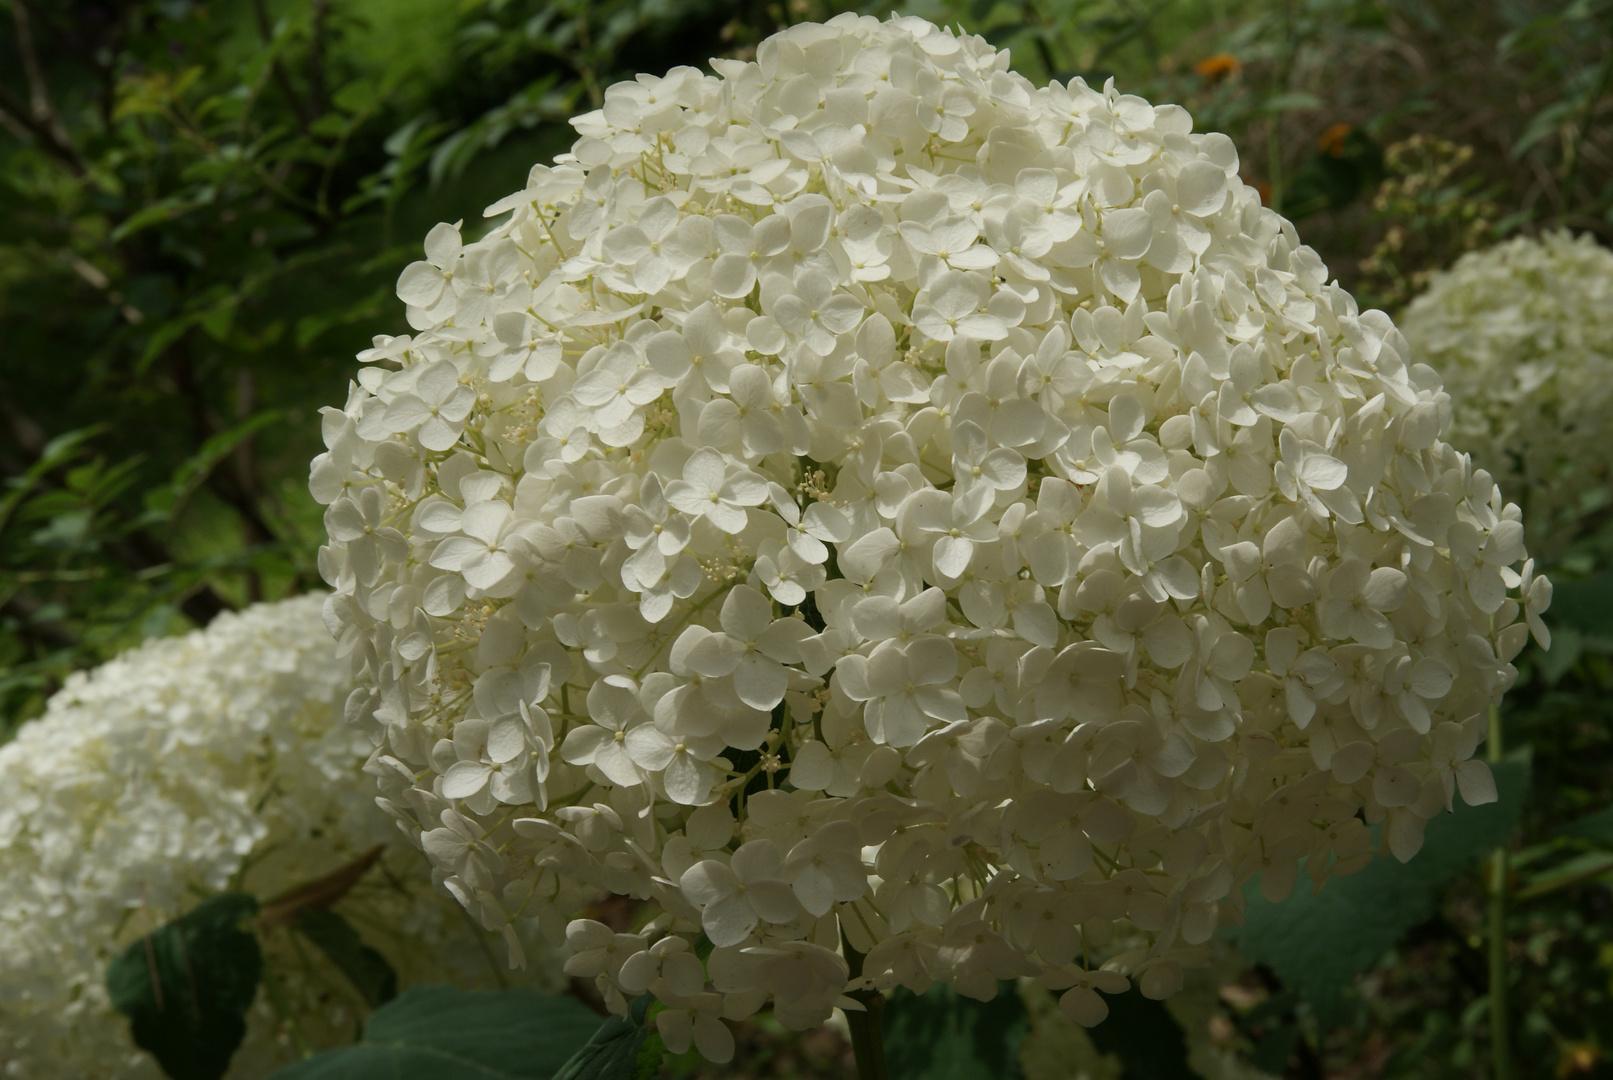 wei e waldhortensie foto bild pflanzen pilze flechten bl ten kleinpflanzen. Black Bedroom Furniture Sets. Home Design Ideas